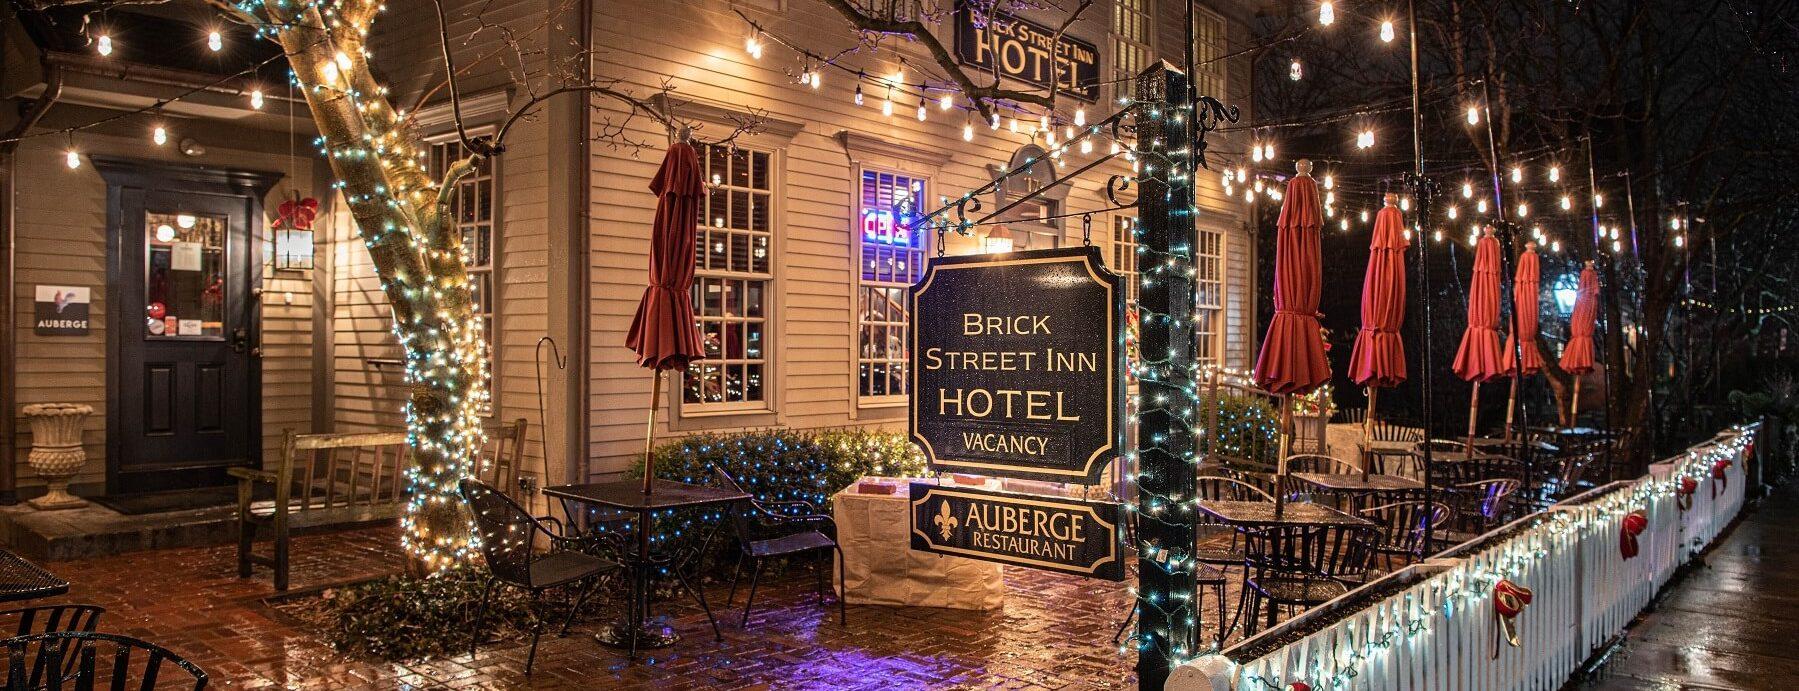 Brick Street Inn Exterior During the Holiday Season